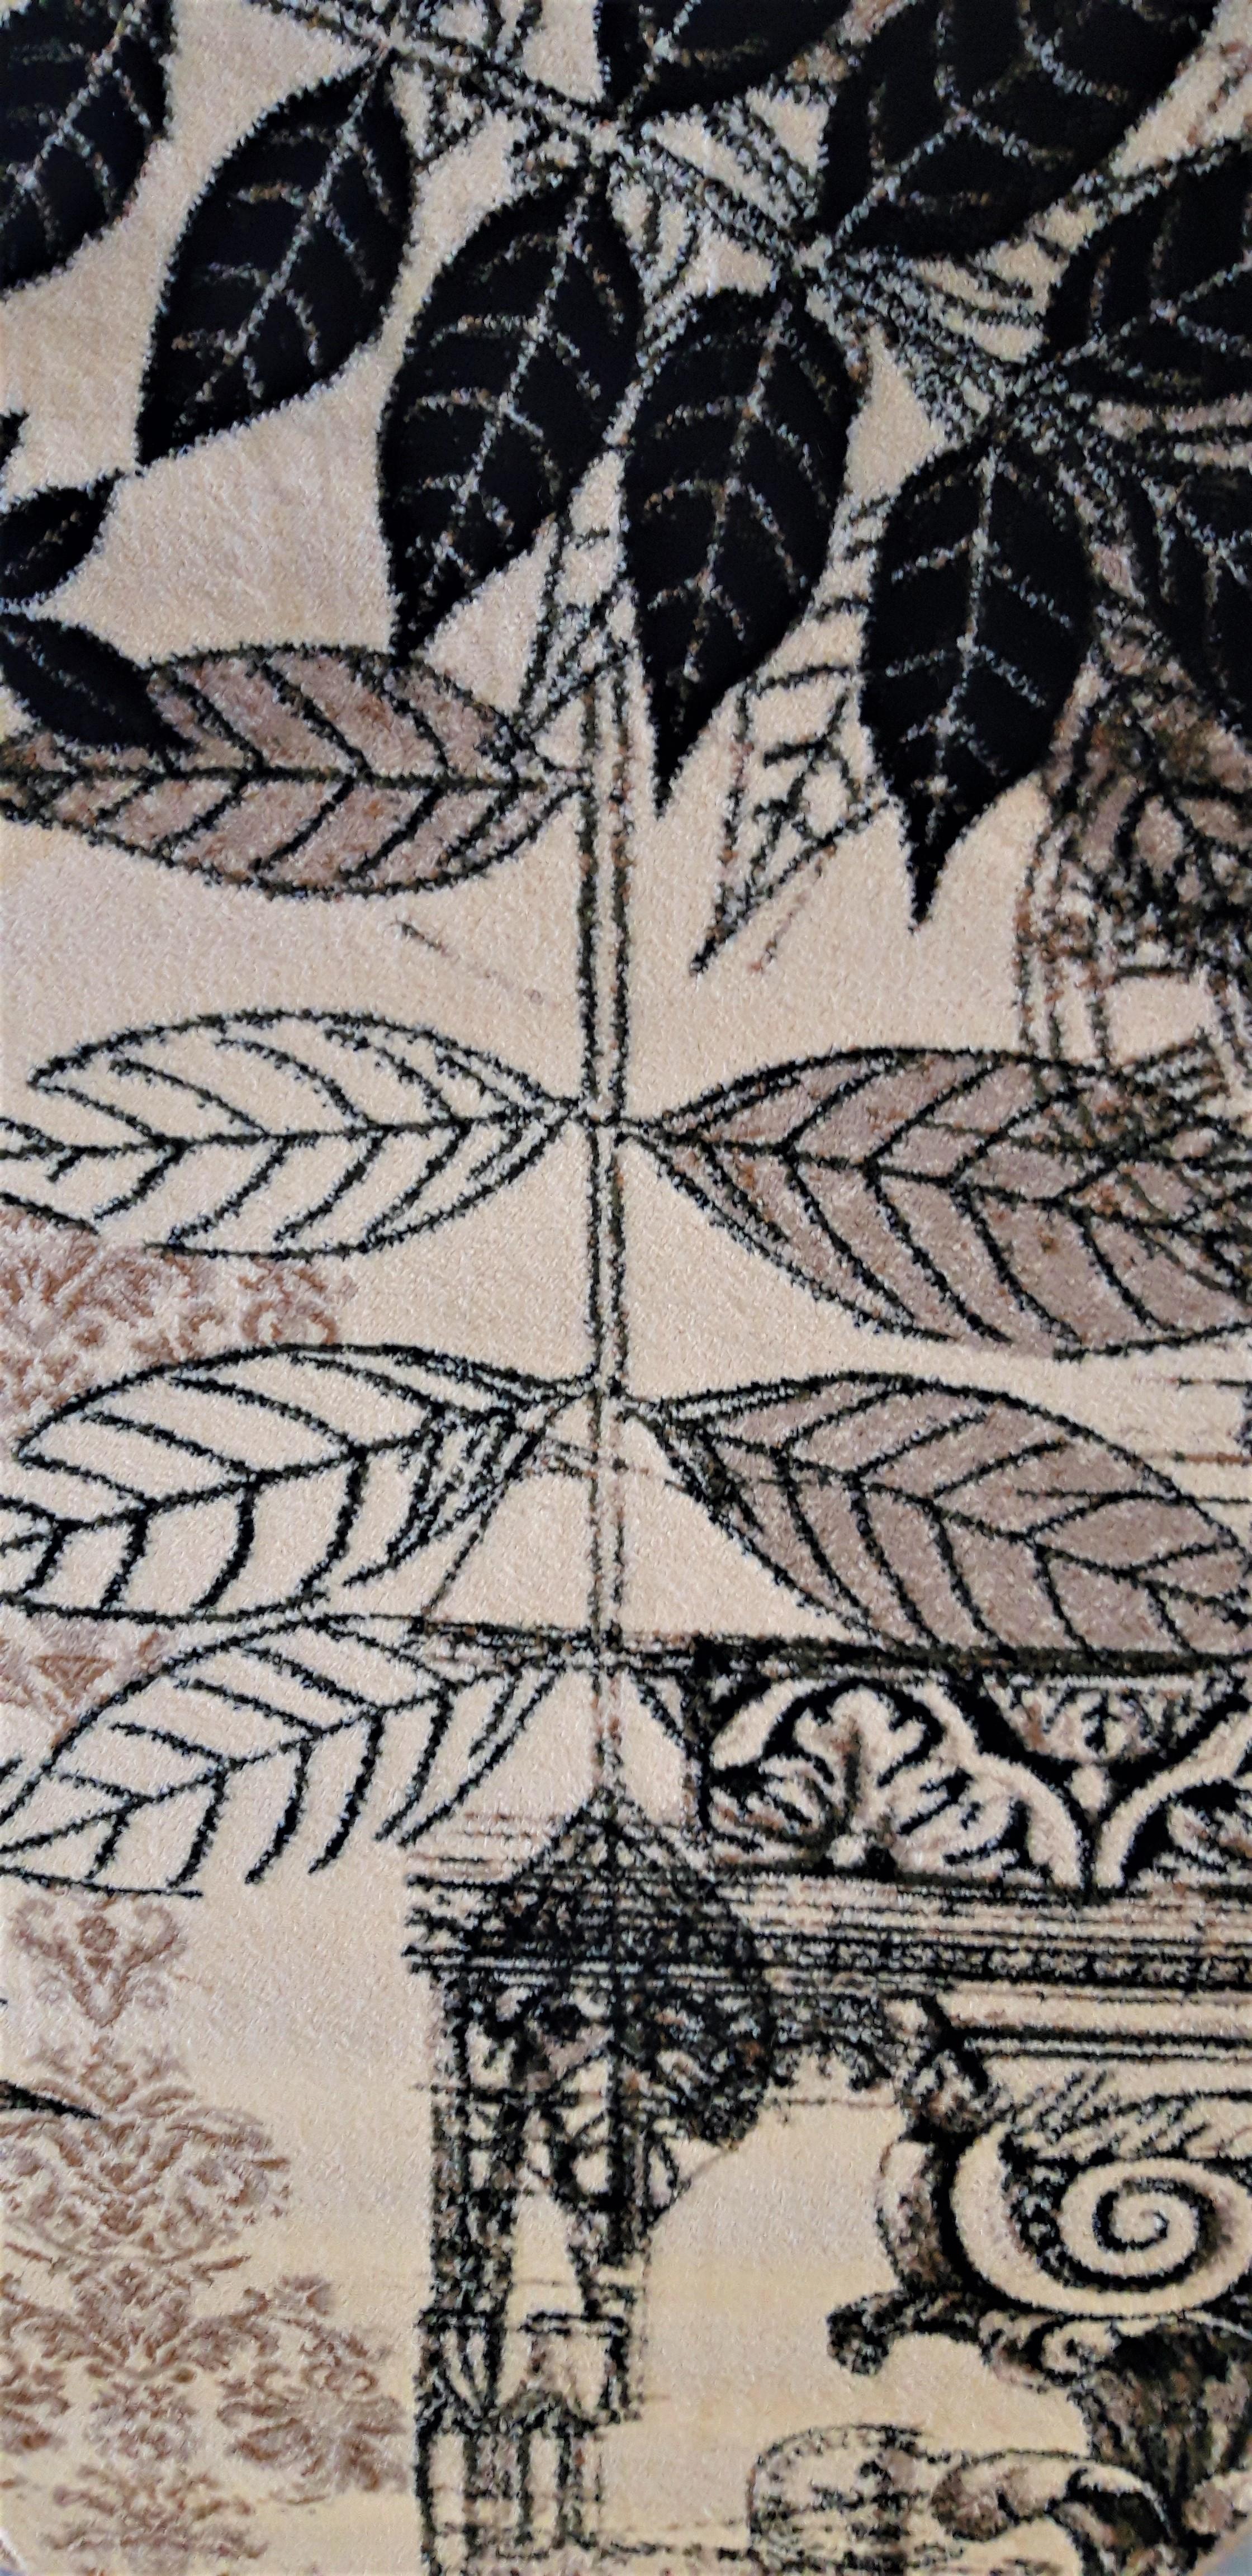 Covor Modern, Lotos Frunze 1545, Crem / Bej / Gri, Oval, 120x170 cm, 1800 gr/mp [6]